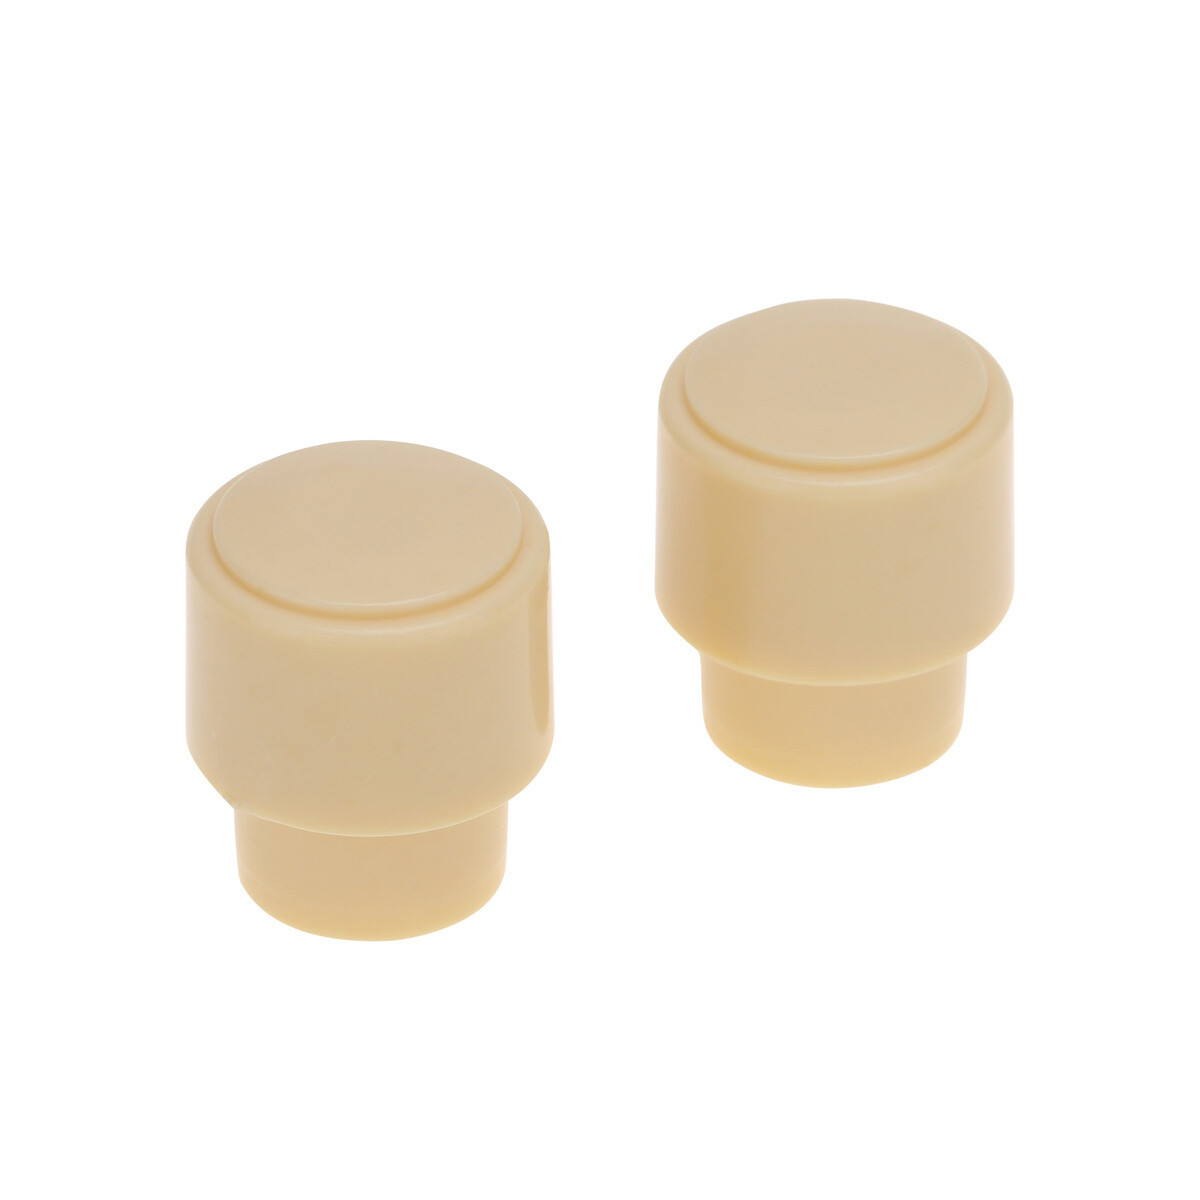 2 x USA Size Telecaster Barrel Switch Tip ( CRL ) Cream